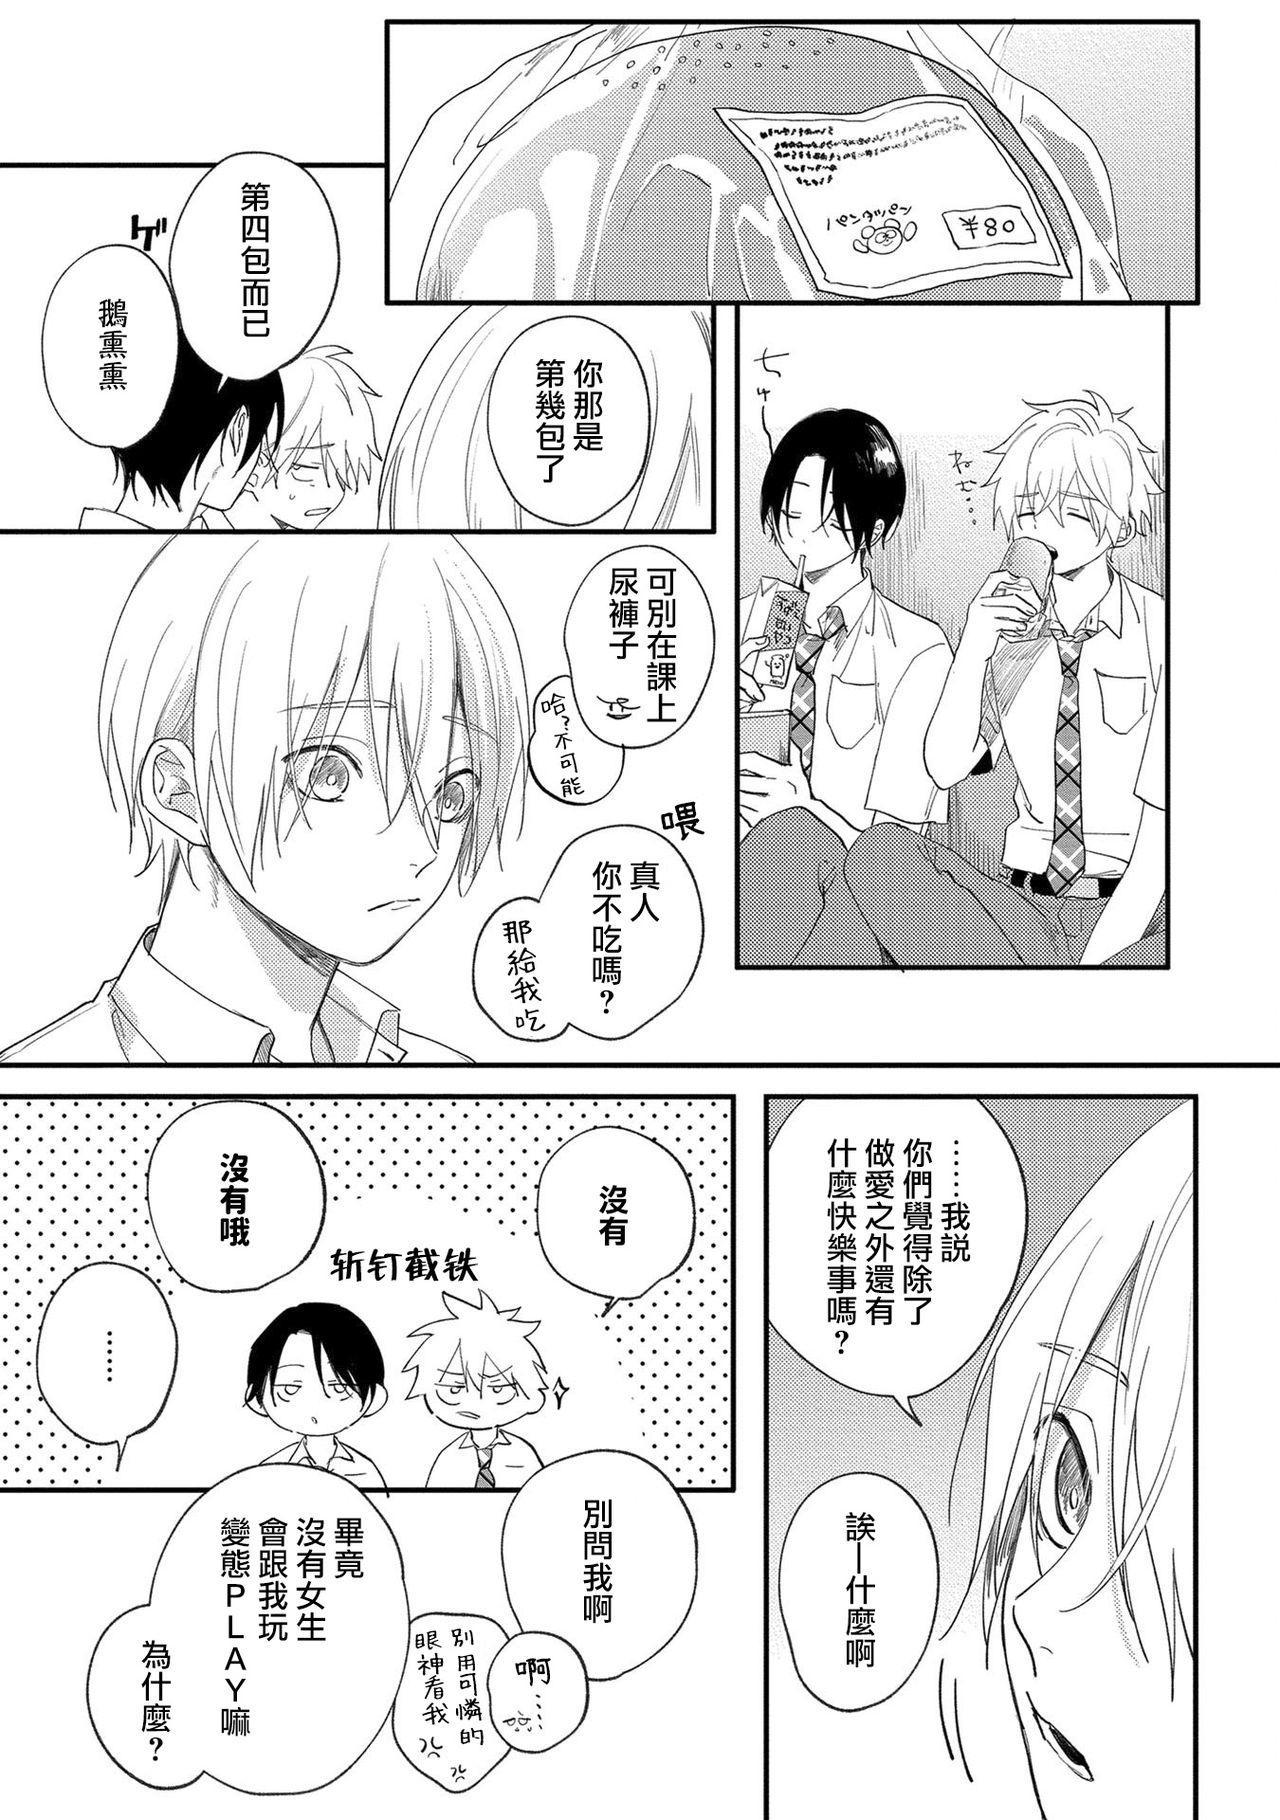 [Utata Hakuto] Houkago Virginity - Virginity afterschool 1-3 [Chinese] [拾荒者汉化组] [Digital] 65